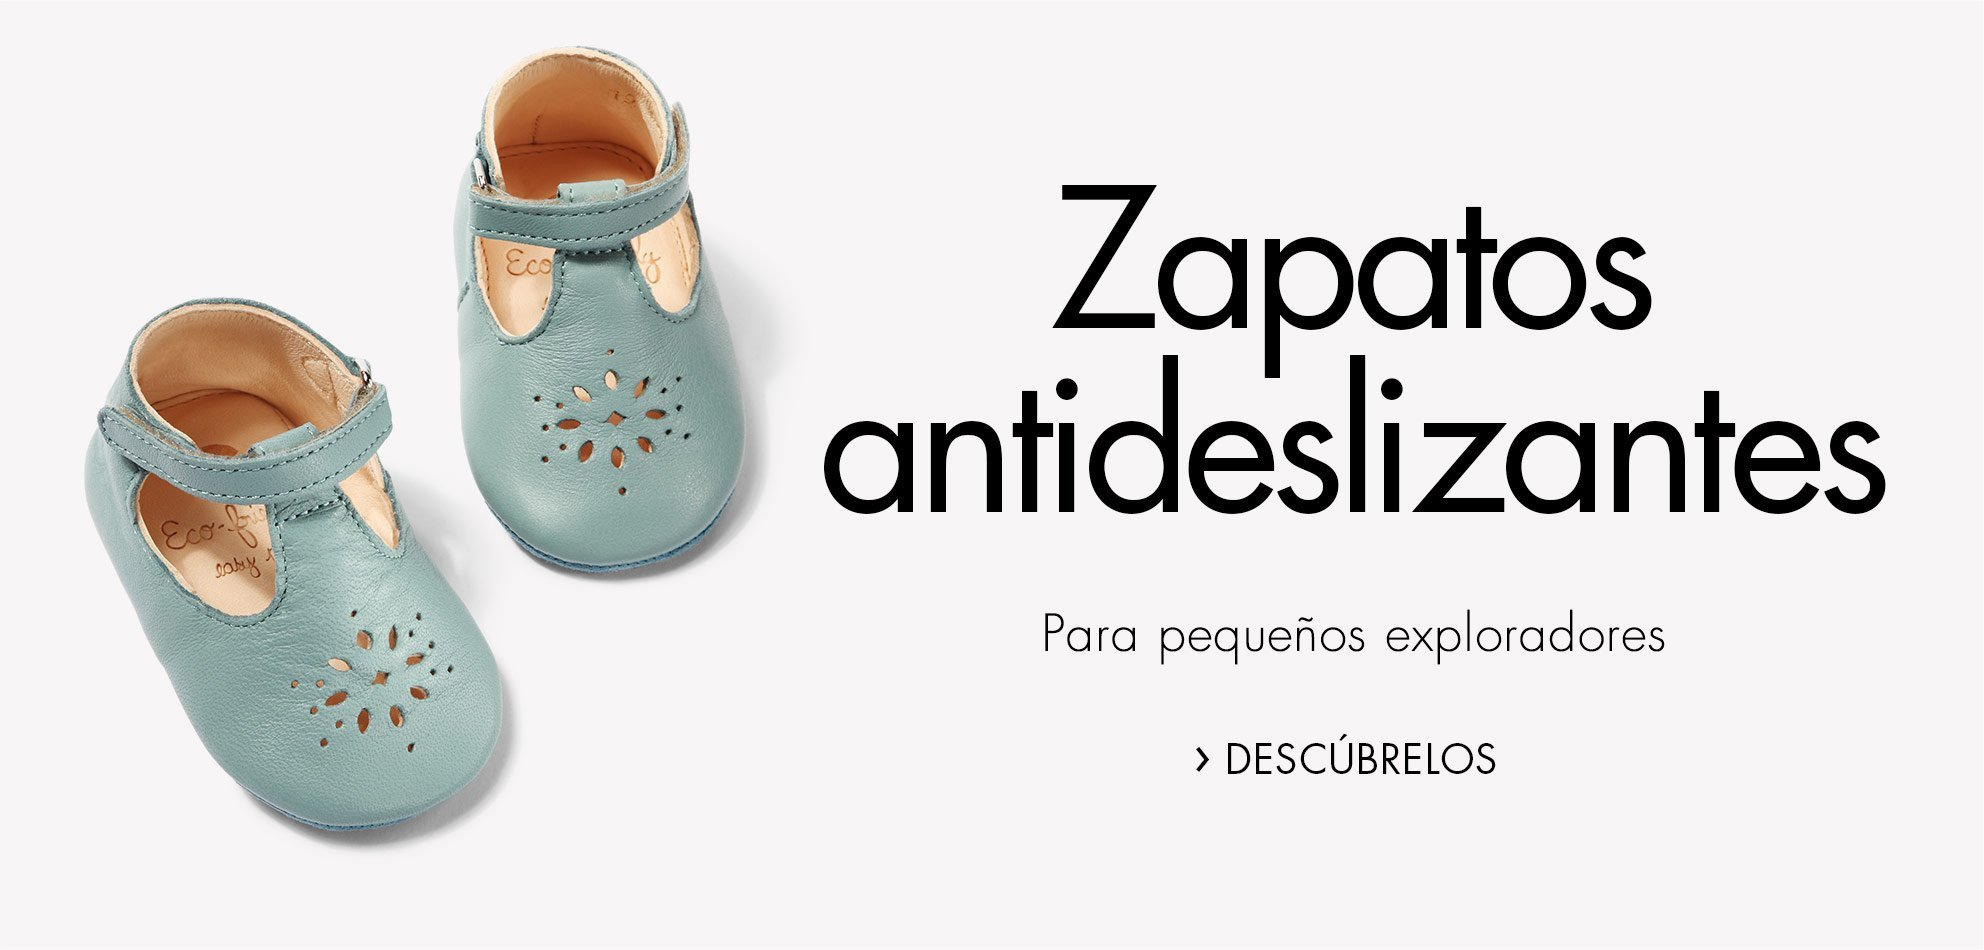 Zapatos anti deslizantes